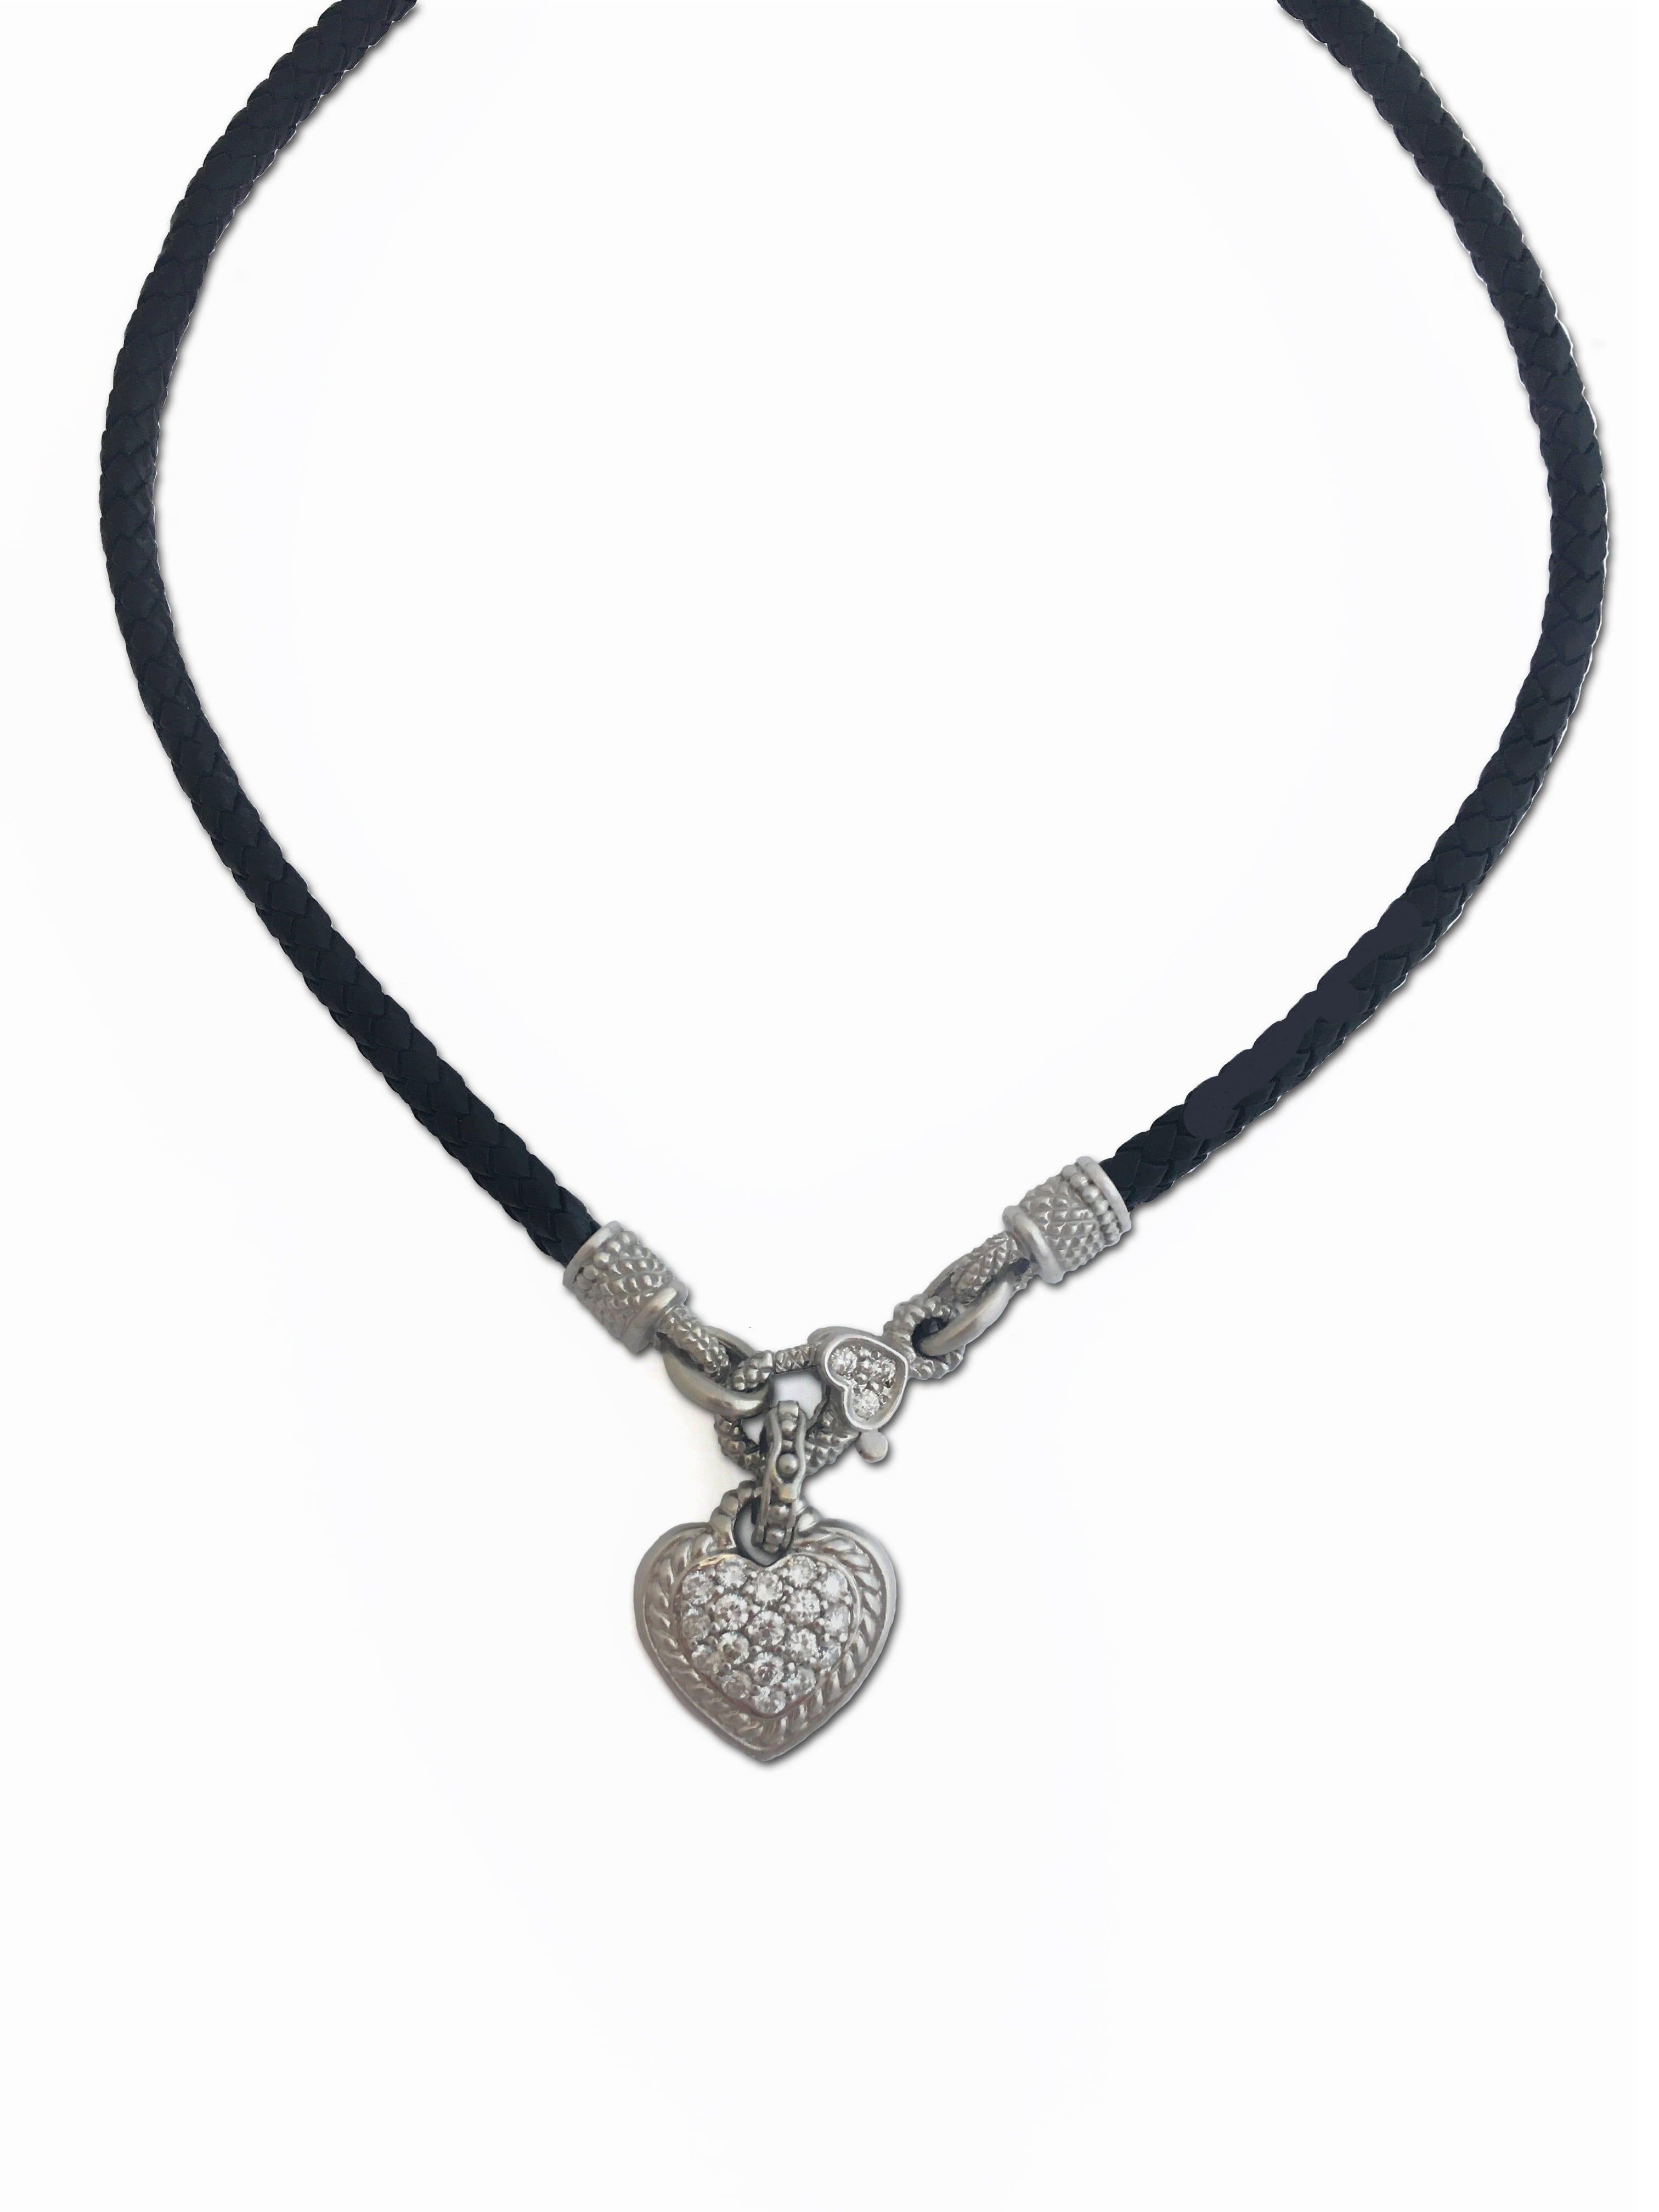 8d4e5619a32 Estate 18kt Designer Judith Ripka Diamond Heart Enhancer